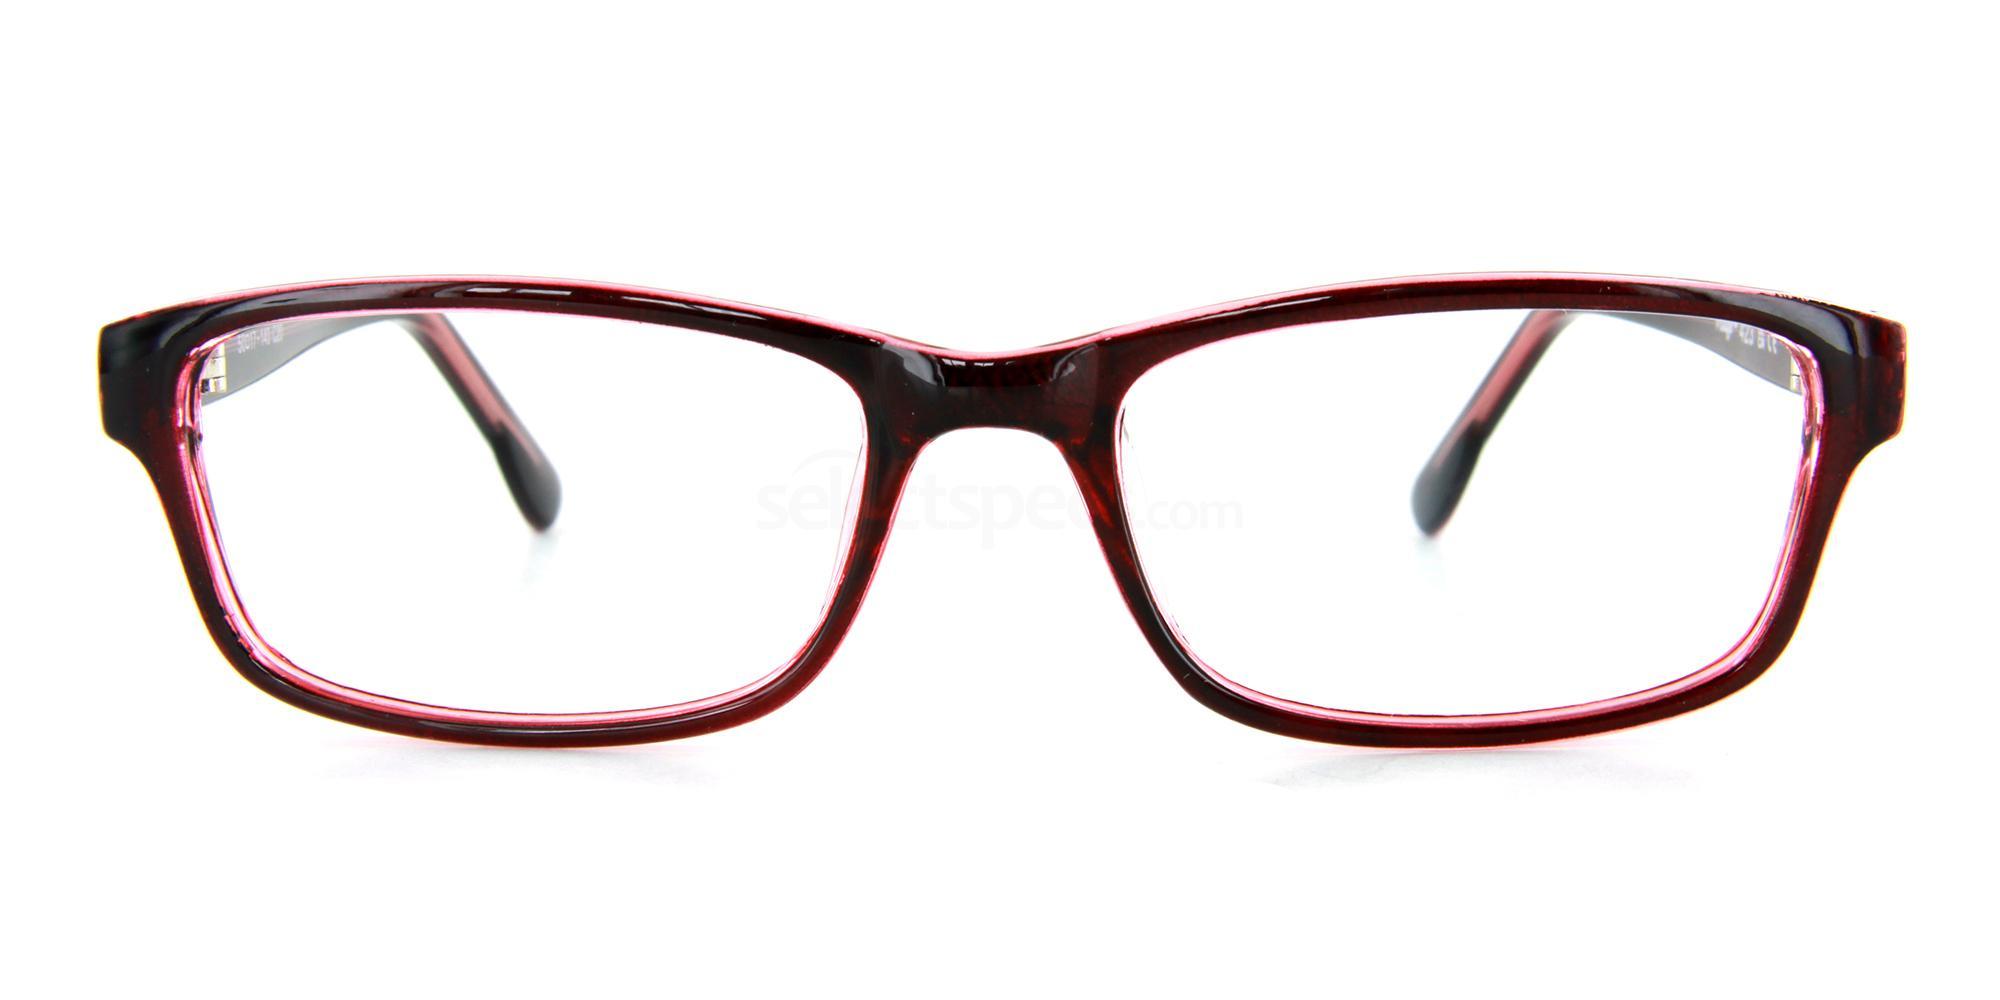 C20 423 Glasses, Visage